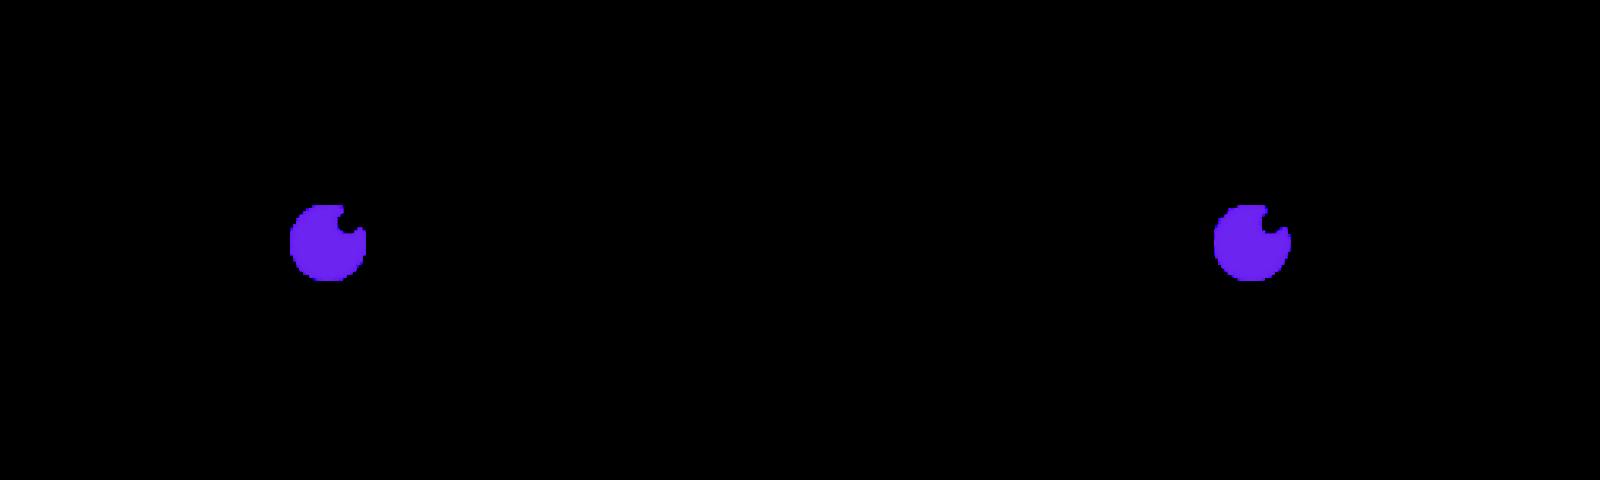 Openvino